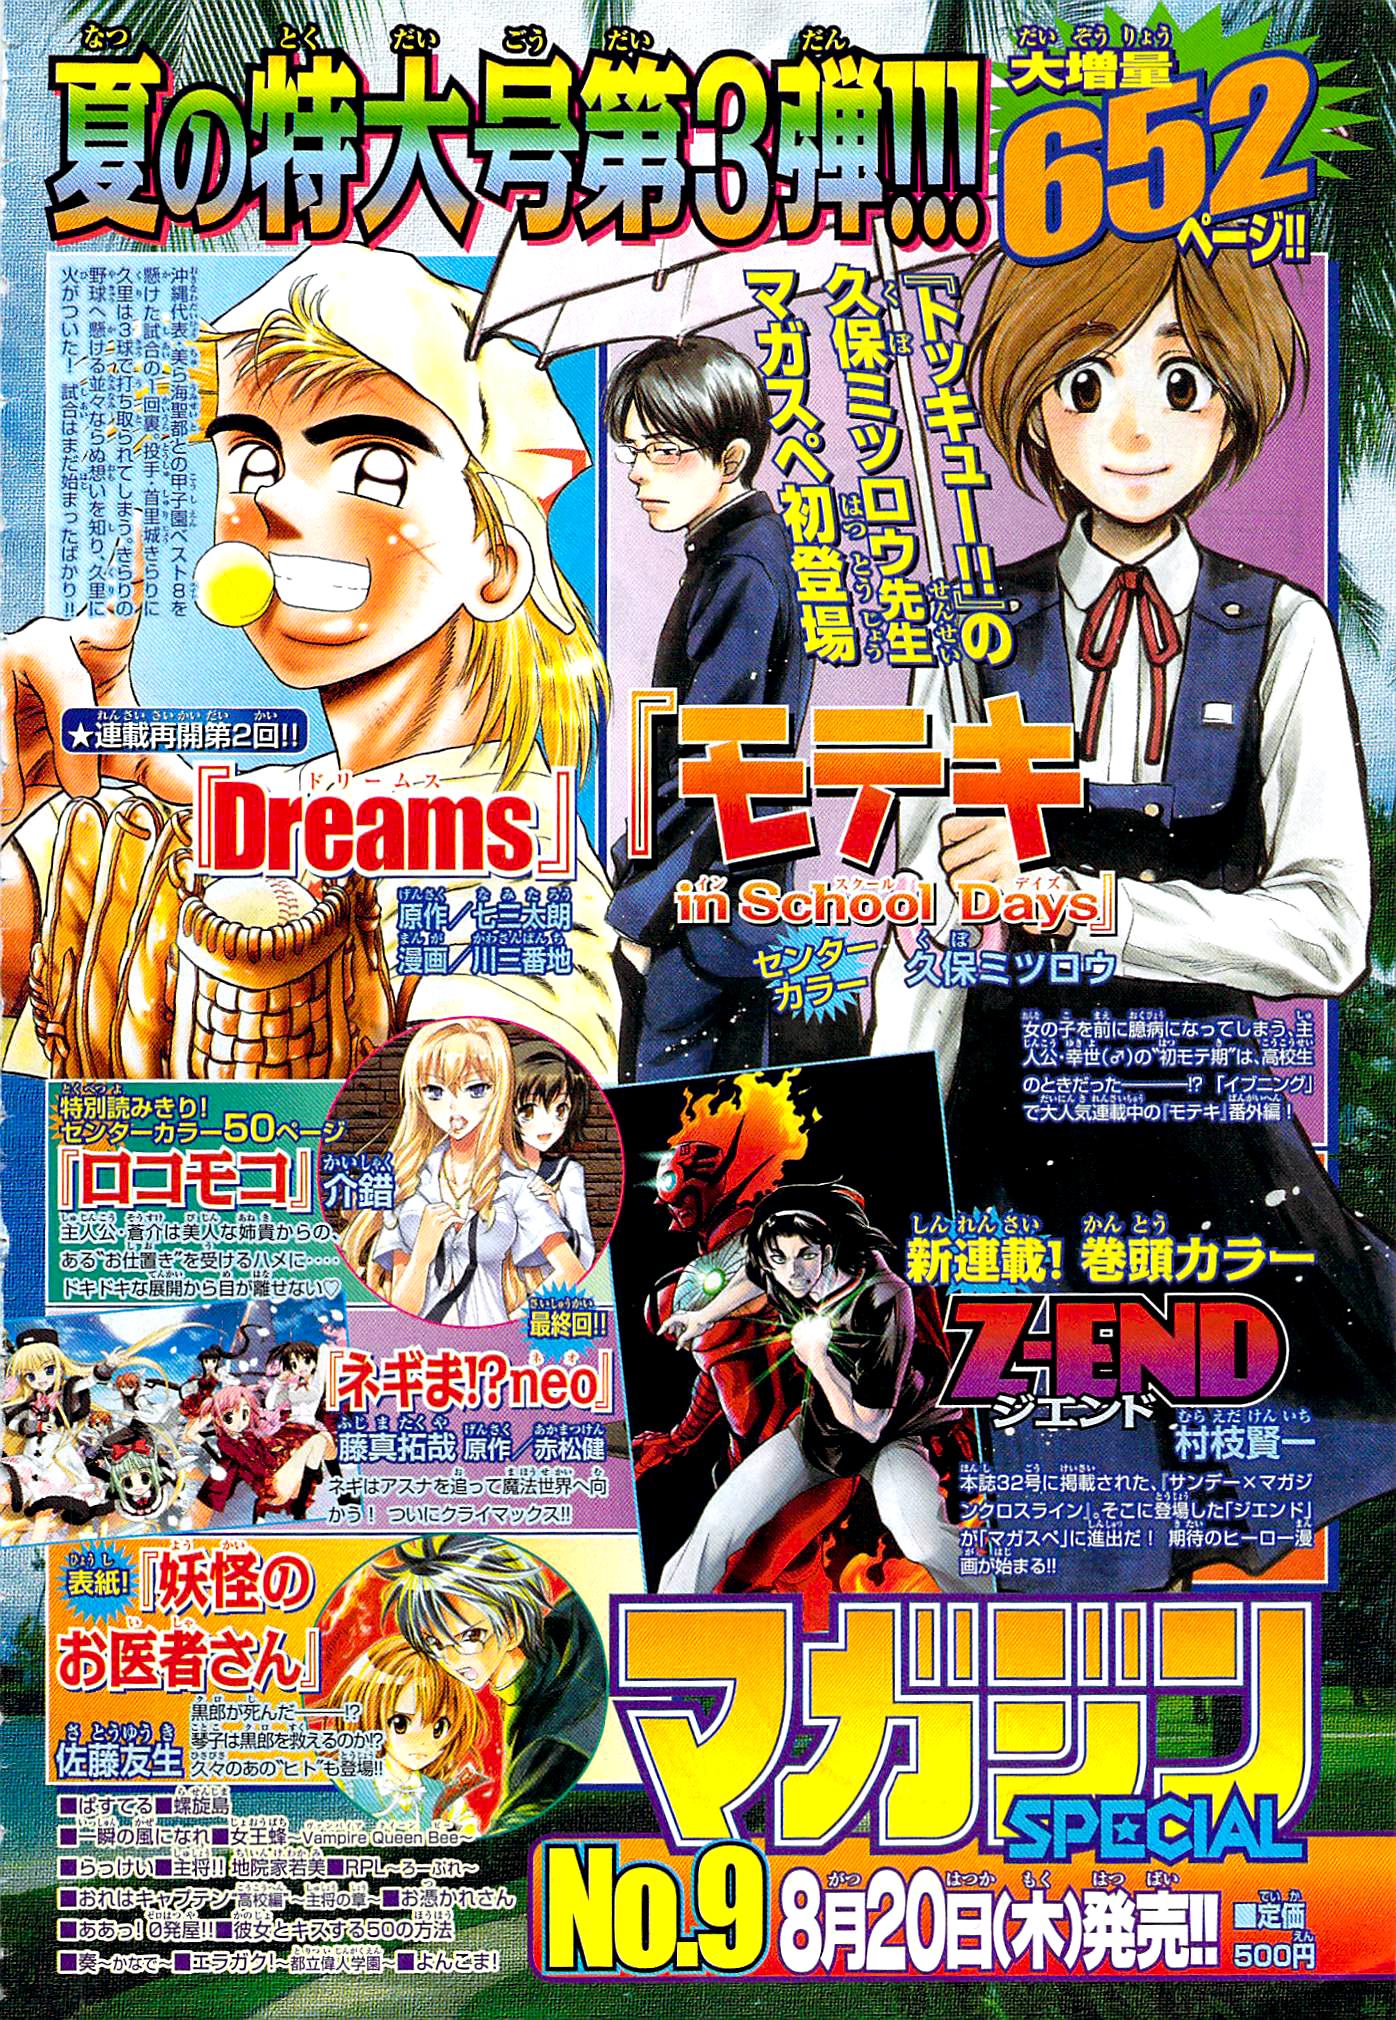 http://c5.ninemanga.com/es_manga/35/419/482049/01256df1af85c6c0a6aecaf18cbce873.jpg Page 4